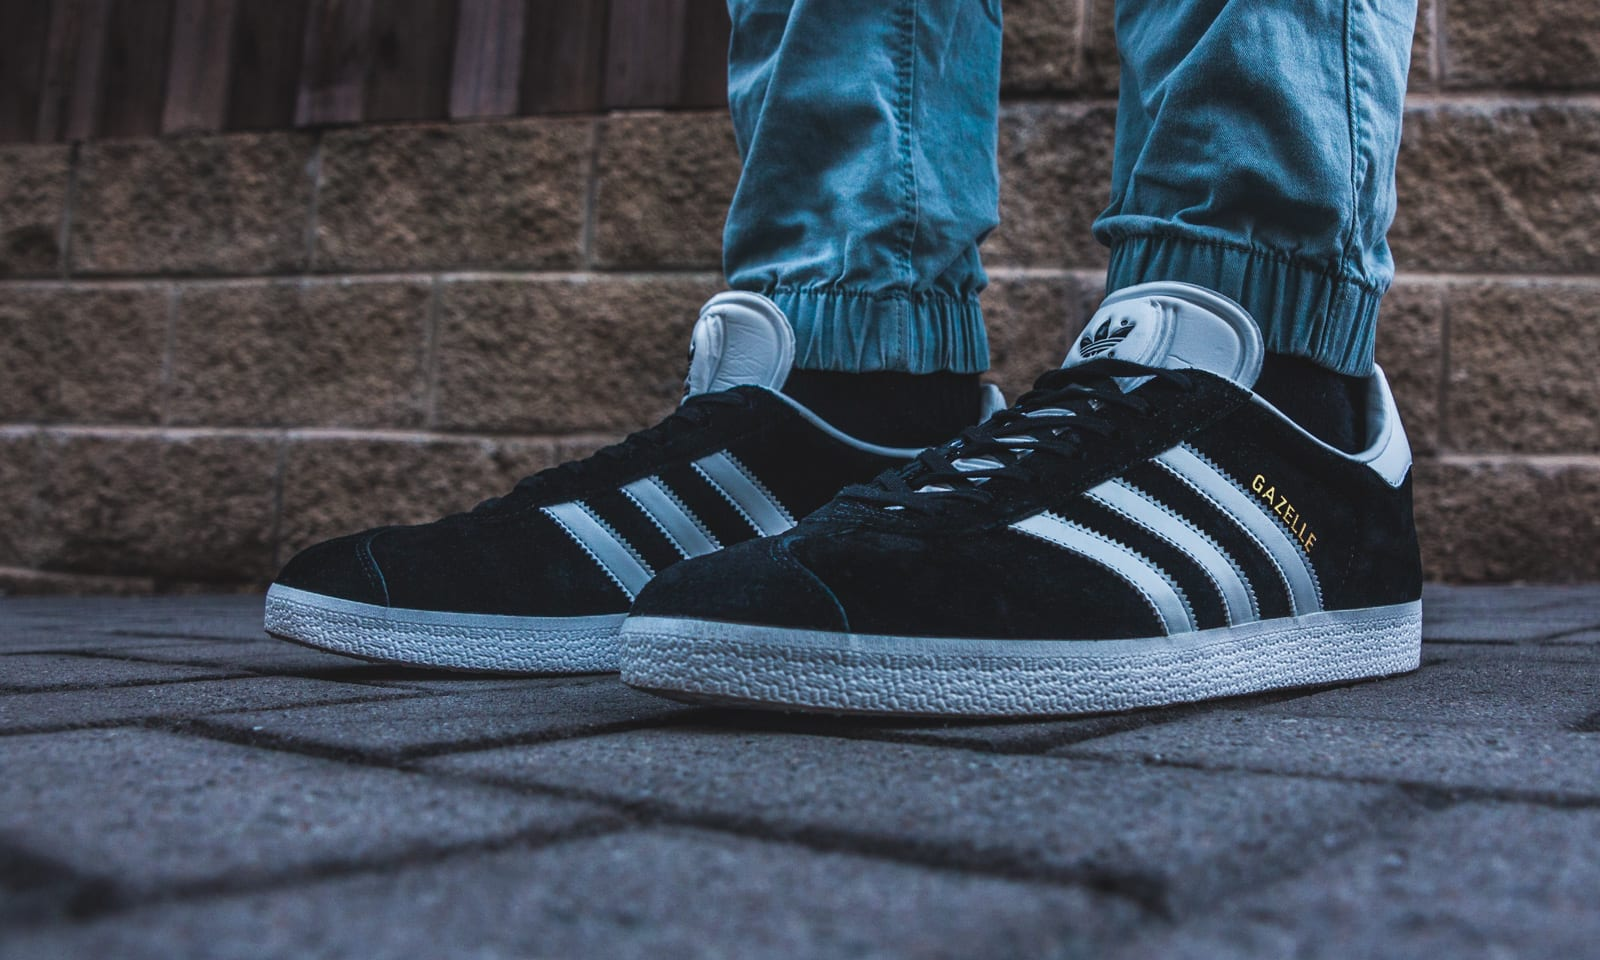 f066c06b6e0 10 Adidas Shoes in 2019 [ 2019 Reviews ] - Shoe Adviser